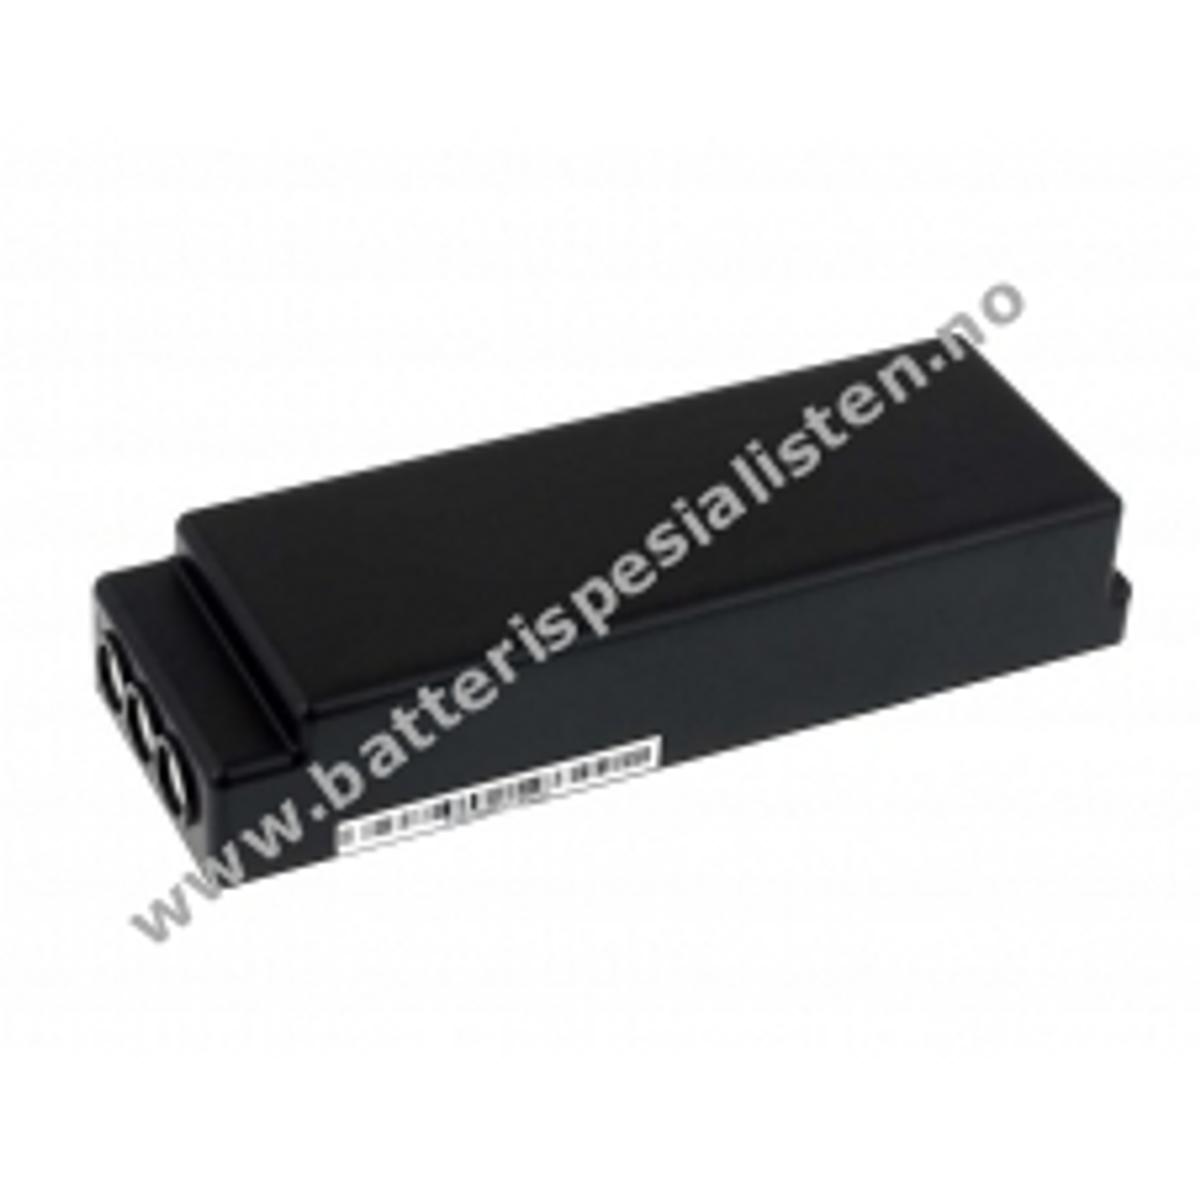 Palfinger Scanreco kranbatteri